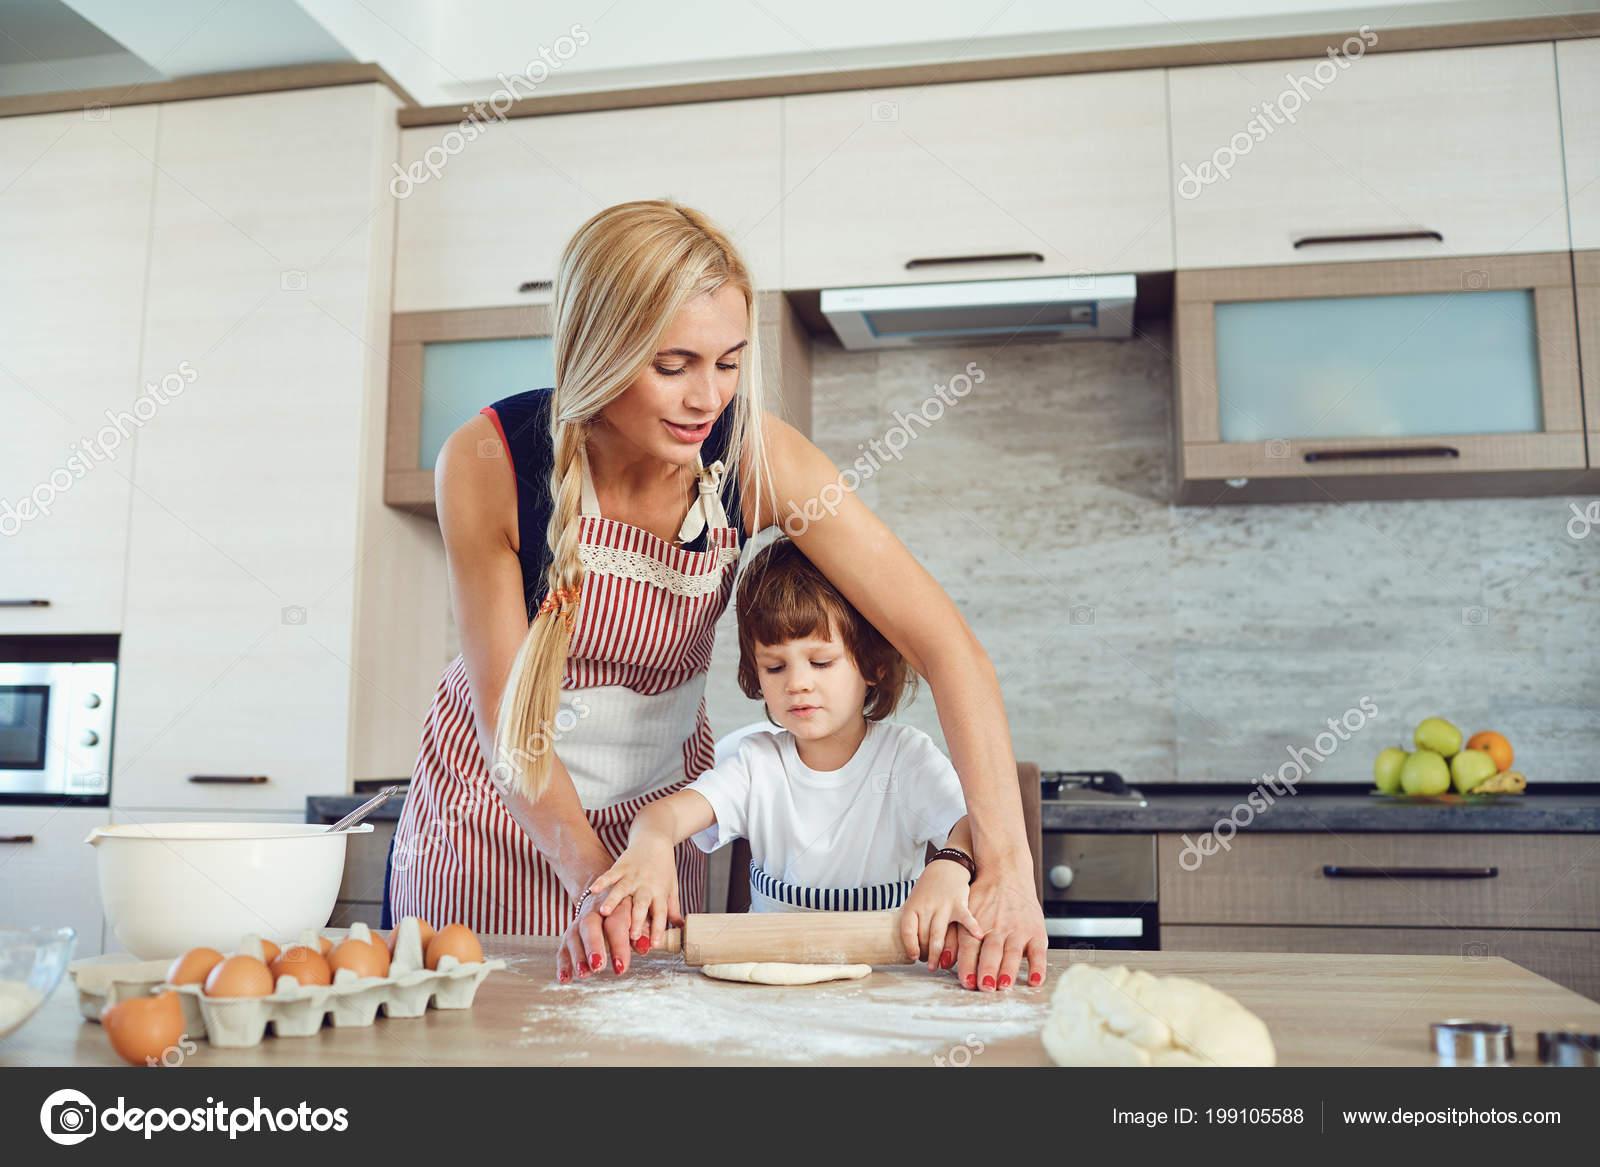 Сын трахнув маму в попу на кухни, Сын ебет маму в жопу на кухне - порно видео онлайн 19 фотография